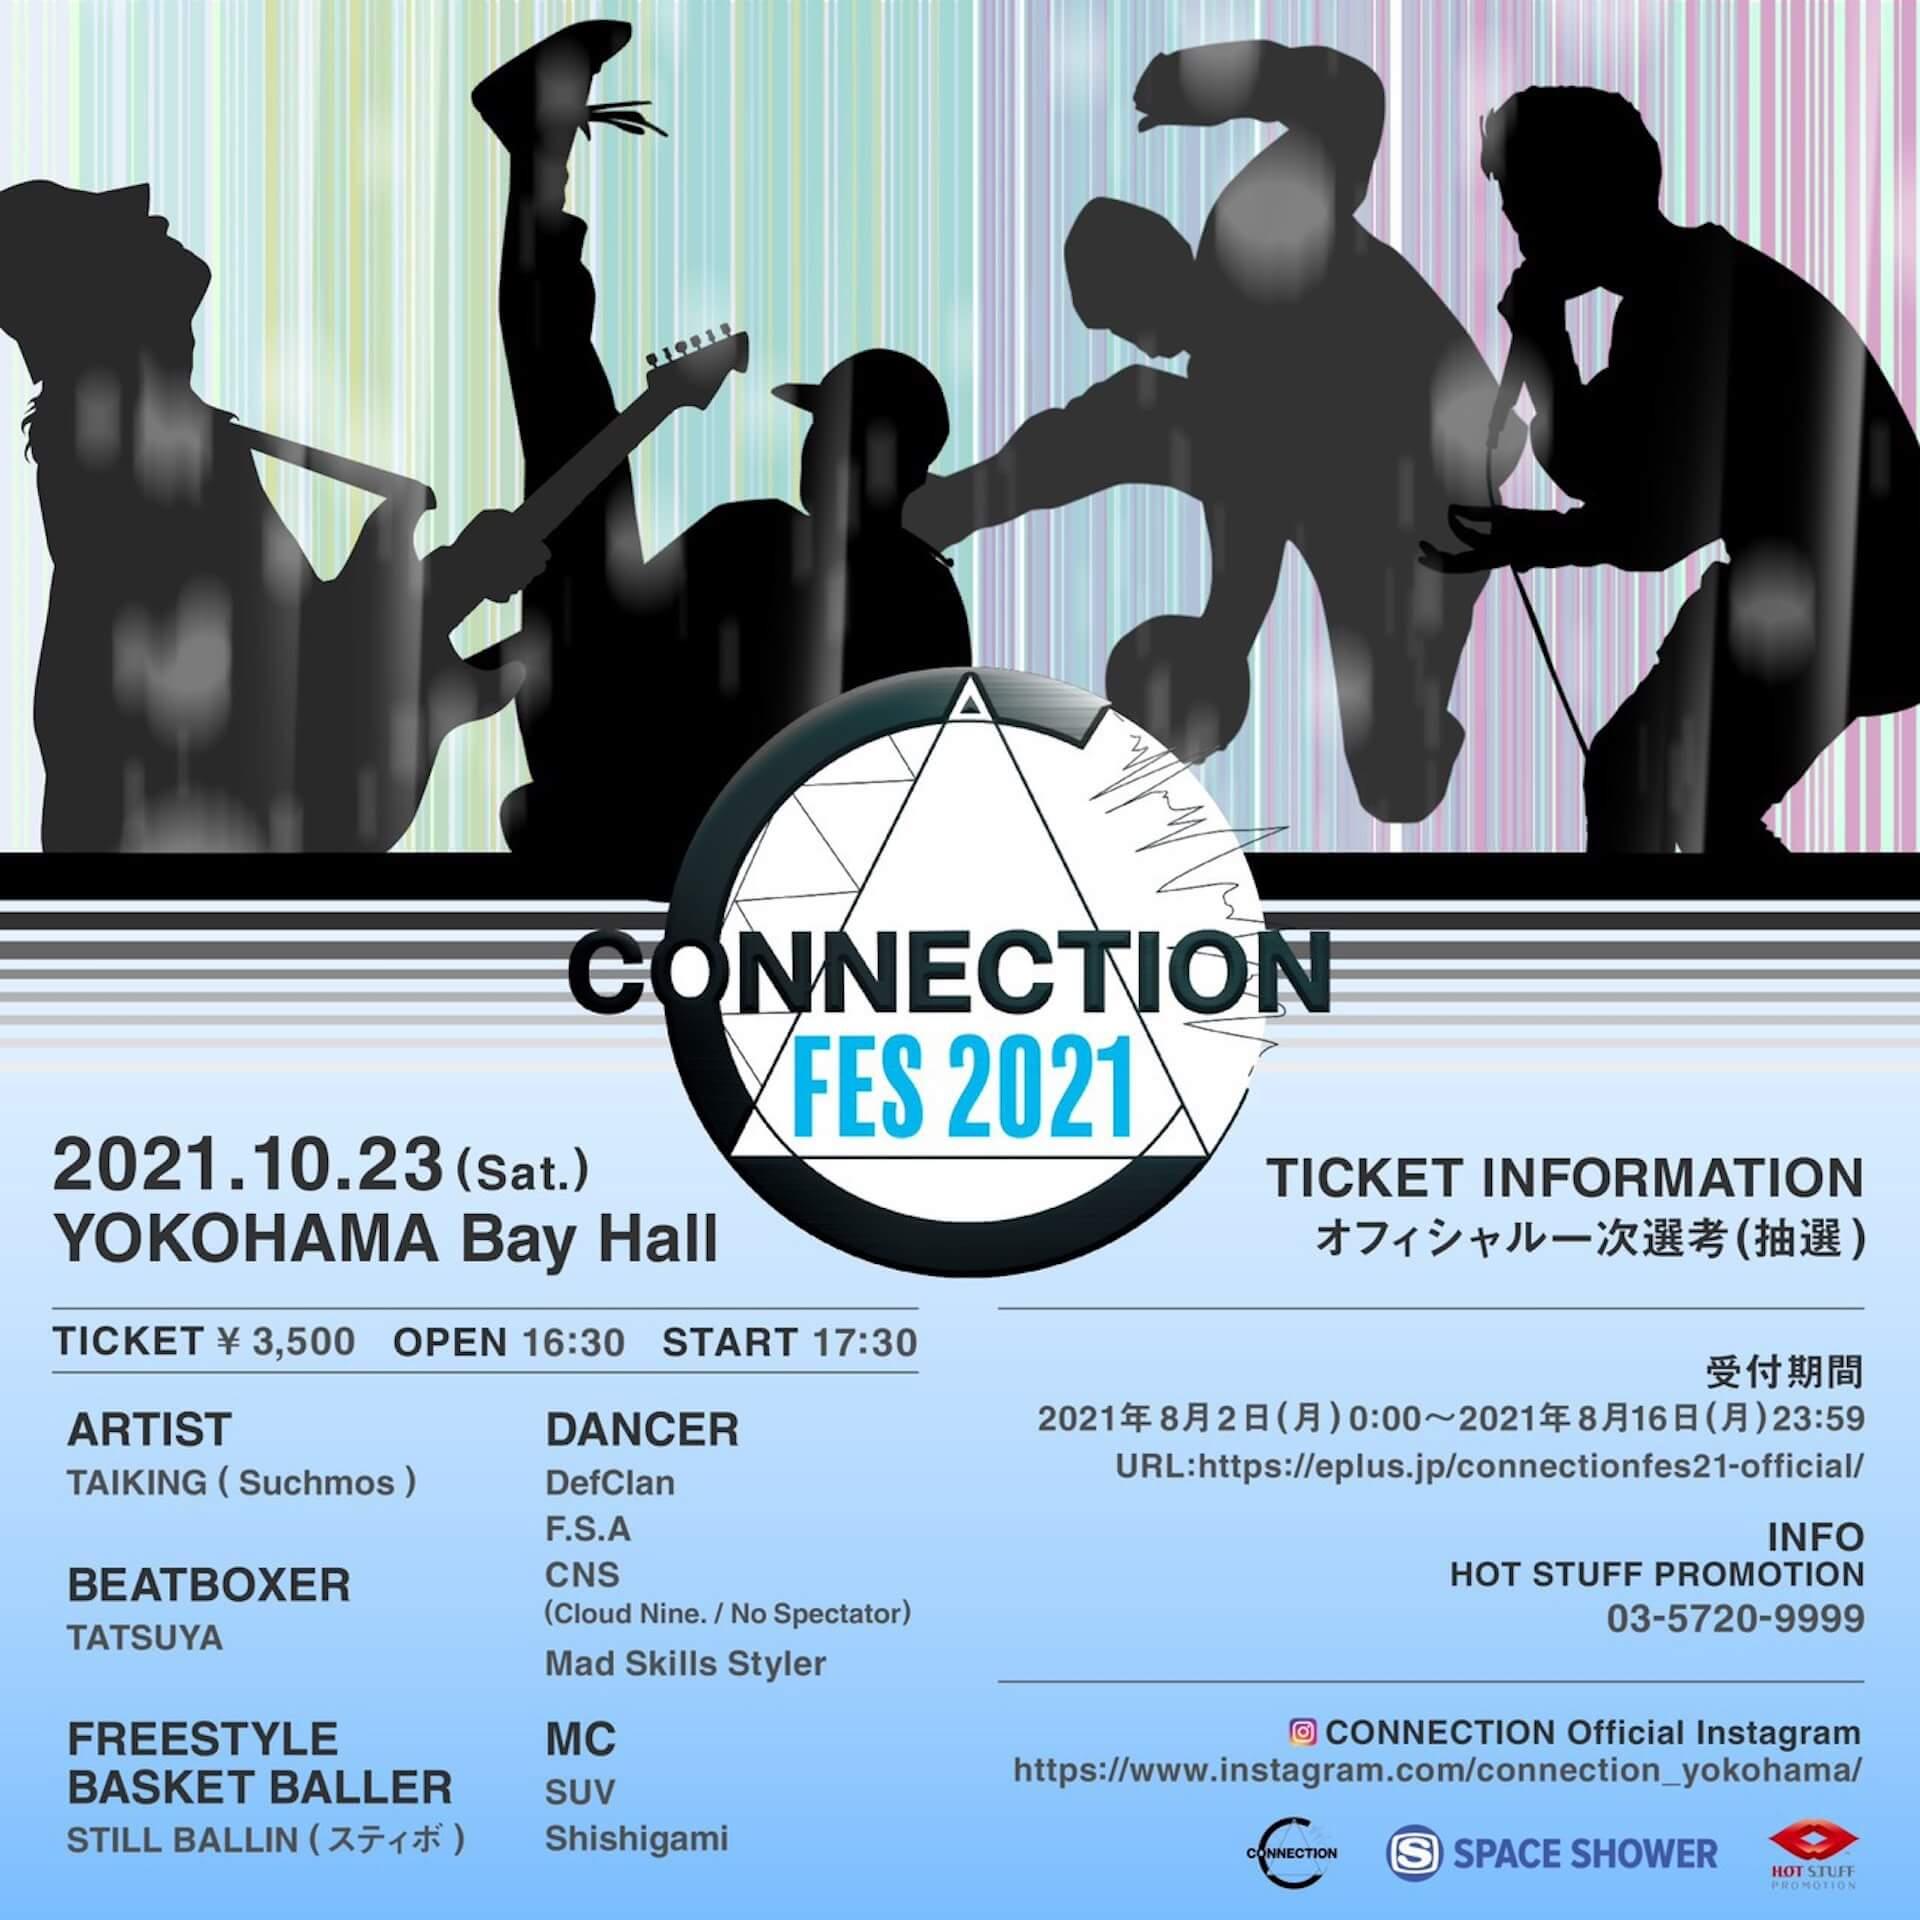 "SuchmosのTAIKINGによる最新曲""Easy""のミュージックビデオが公開!地元・横浜でのイベント開催も発表 music210802_taiking_2"